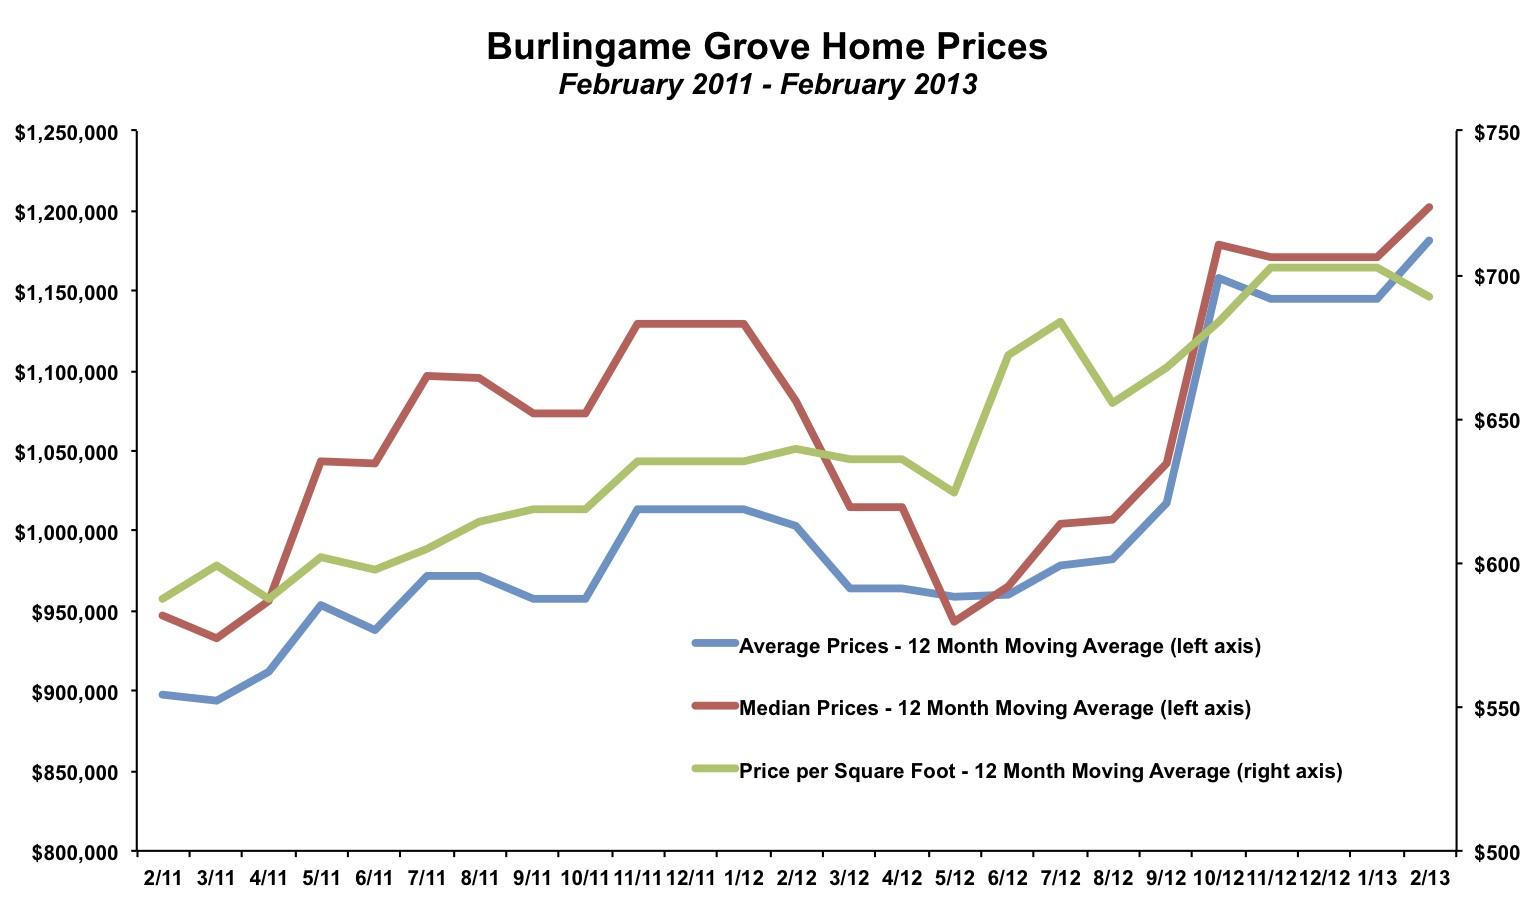 Burlingame Grove Home Prices February 2013